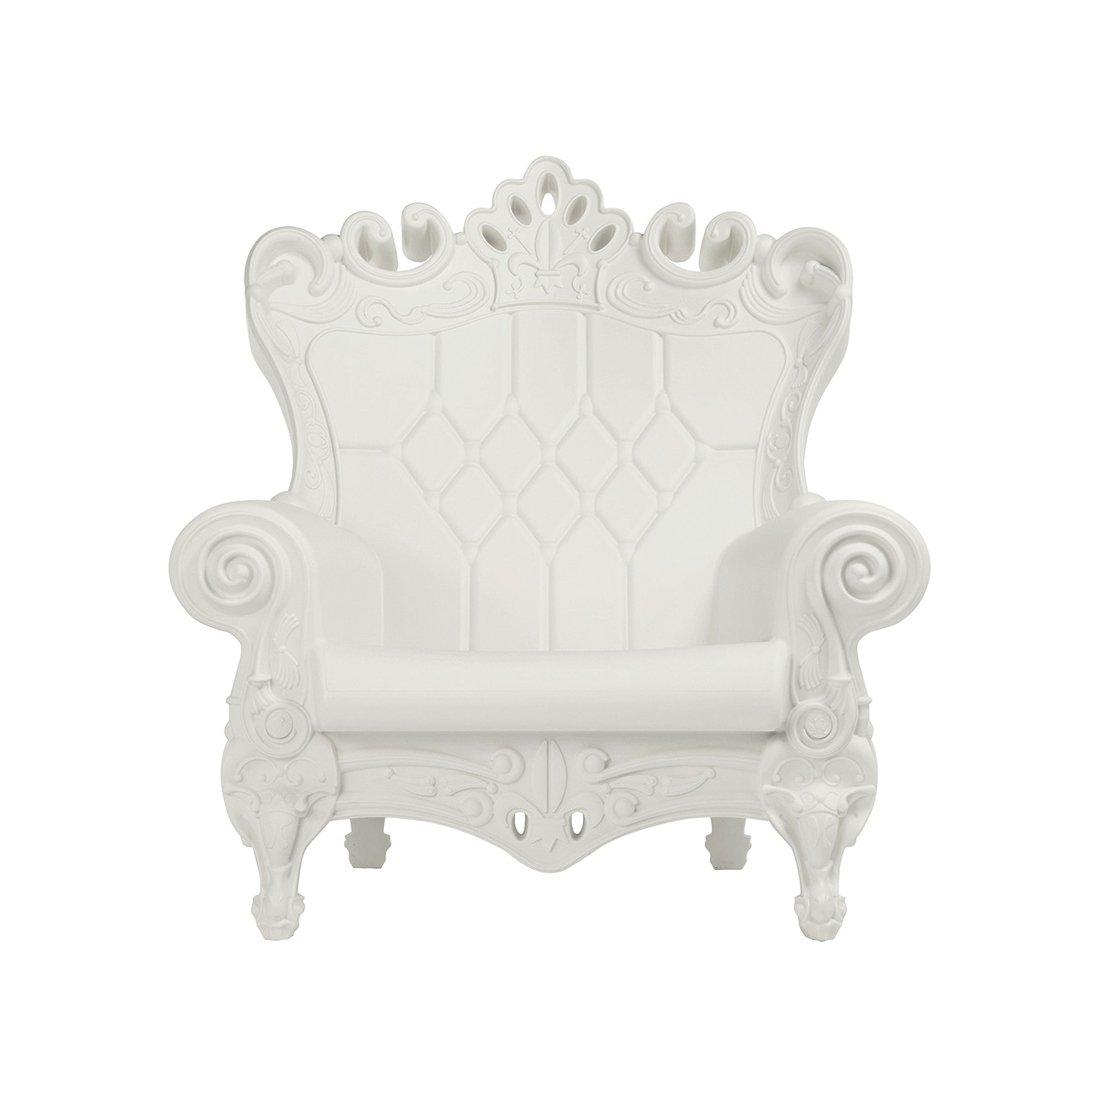 Design of Love - Slide Design - Little Queen of Love Baby armchair Milky White (Original made in Italy)